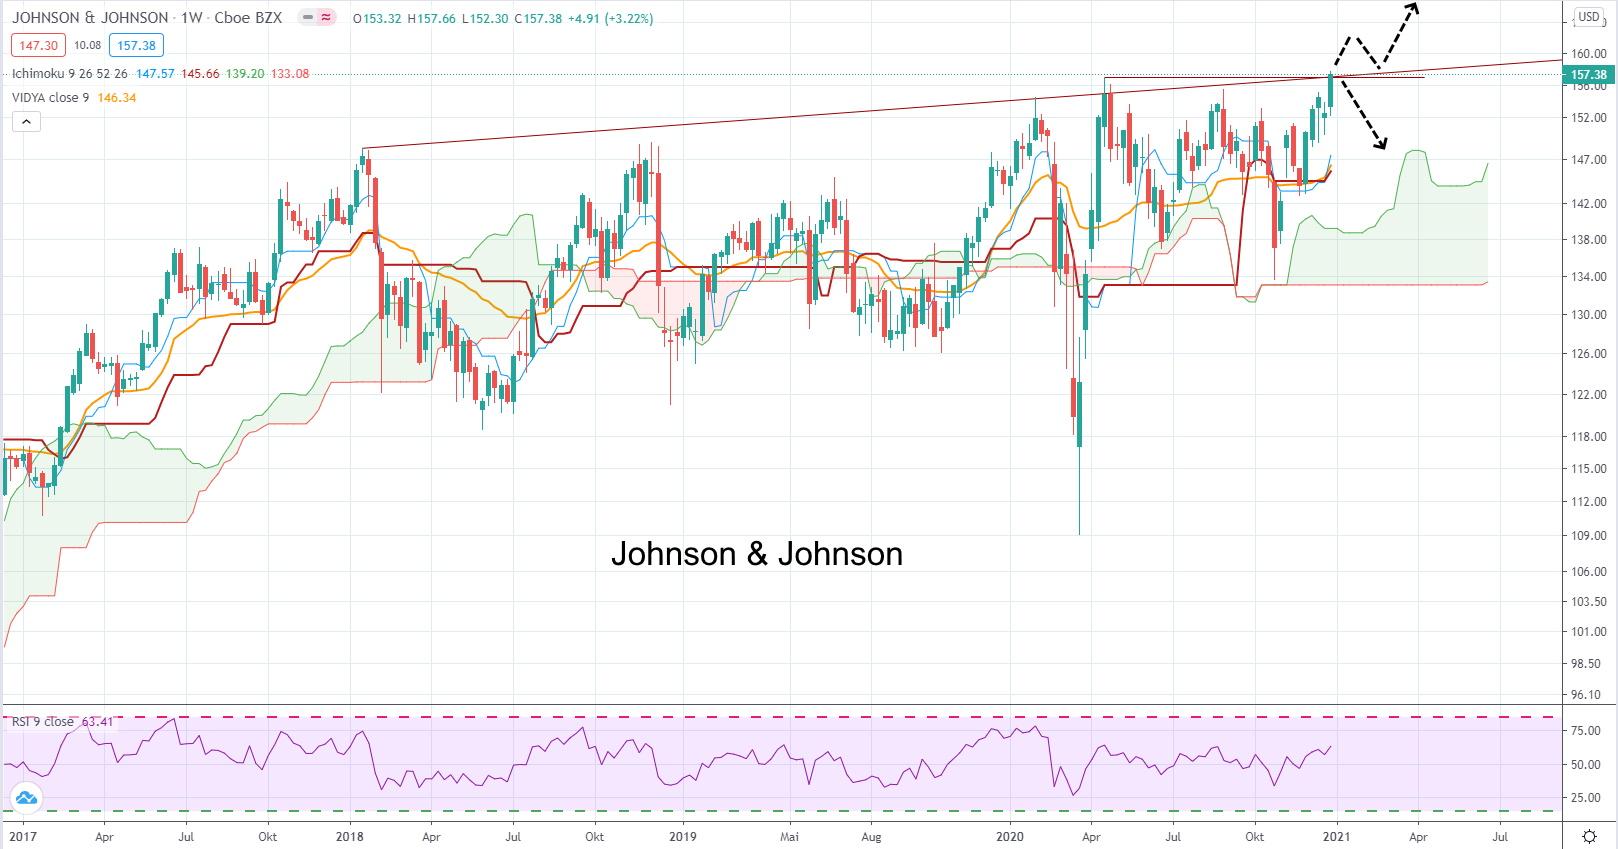 Johnson & Johnson - aktuelle Chartanalyse von Lars Hattwig